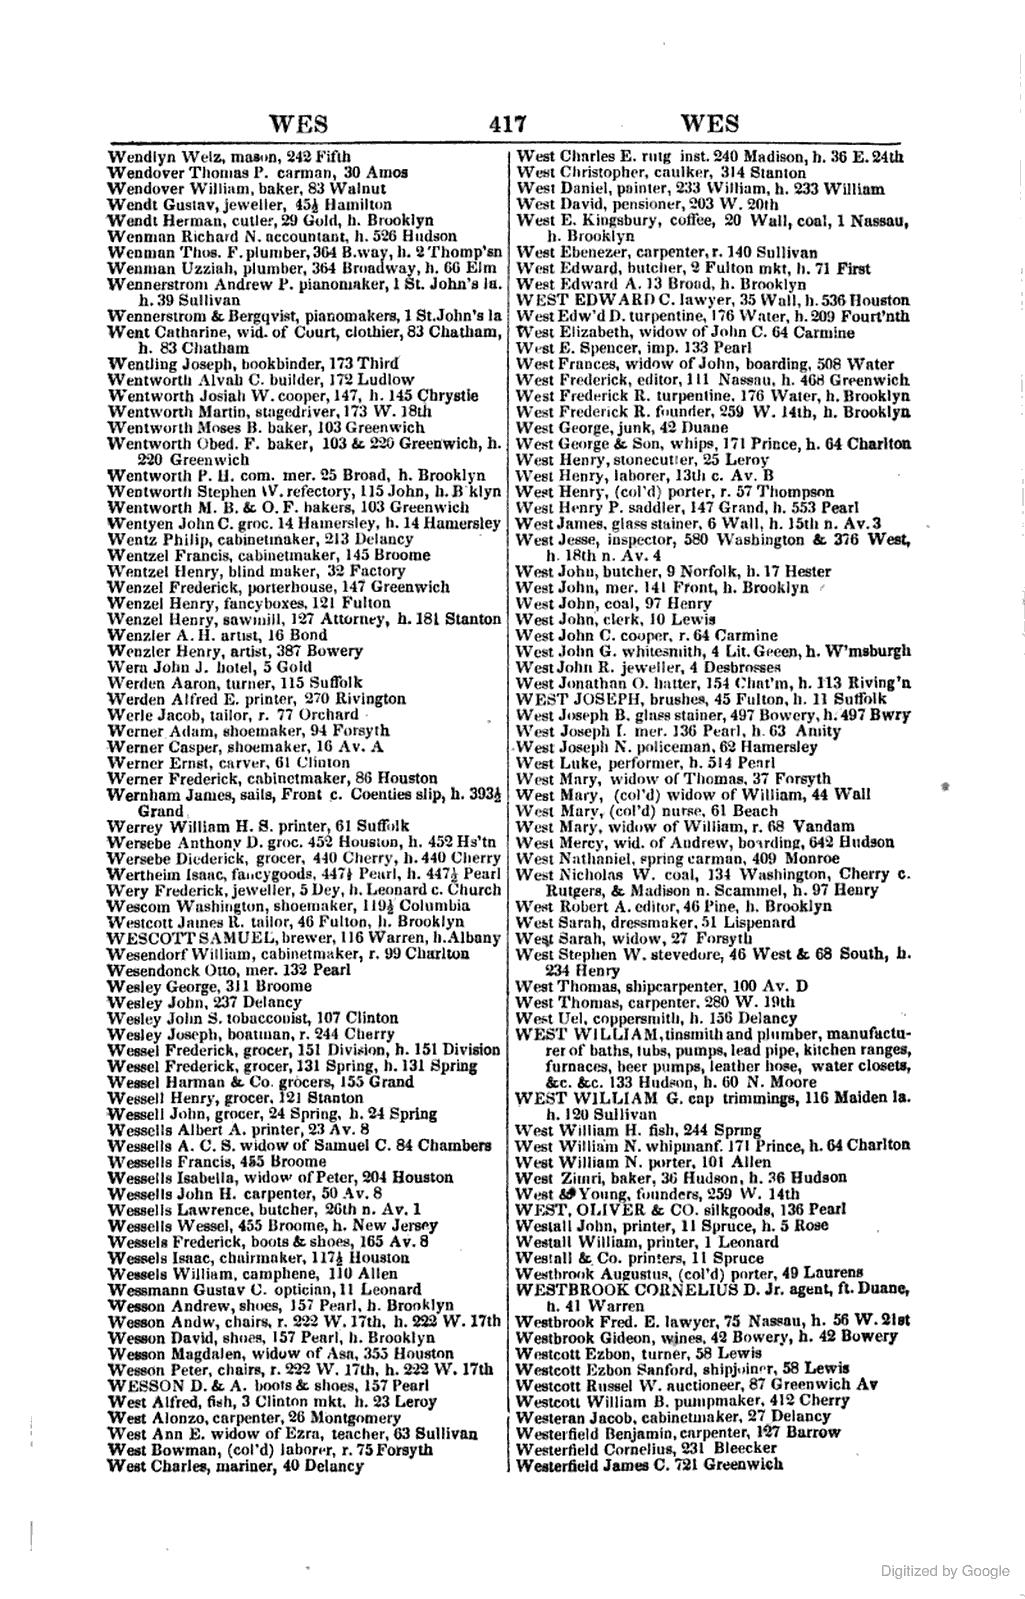 [1847]: WESTBROOK Gideon. WINES. 42 Bowery